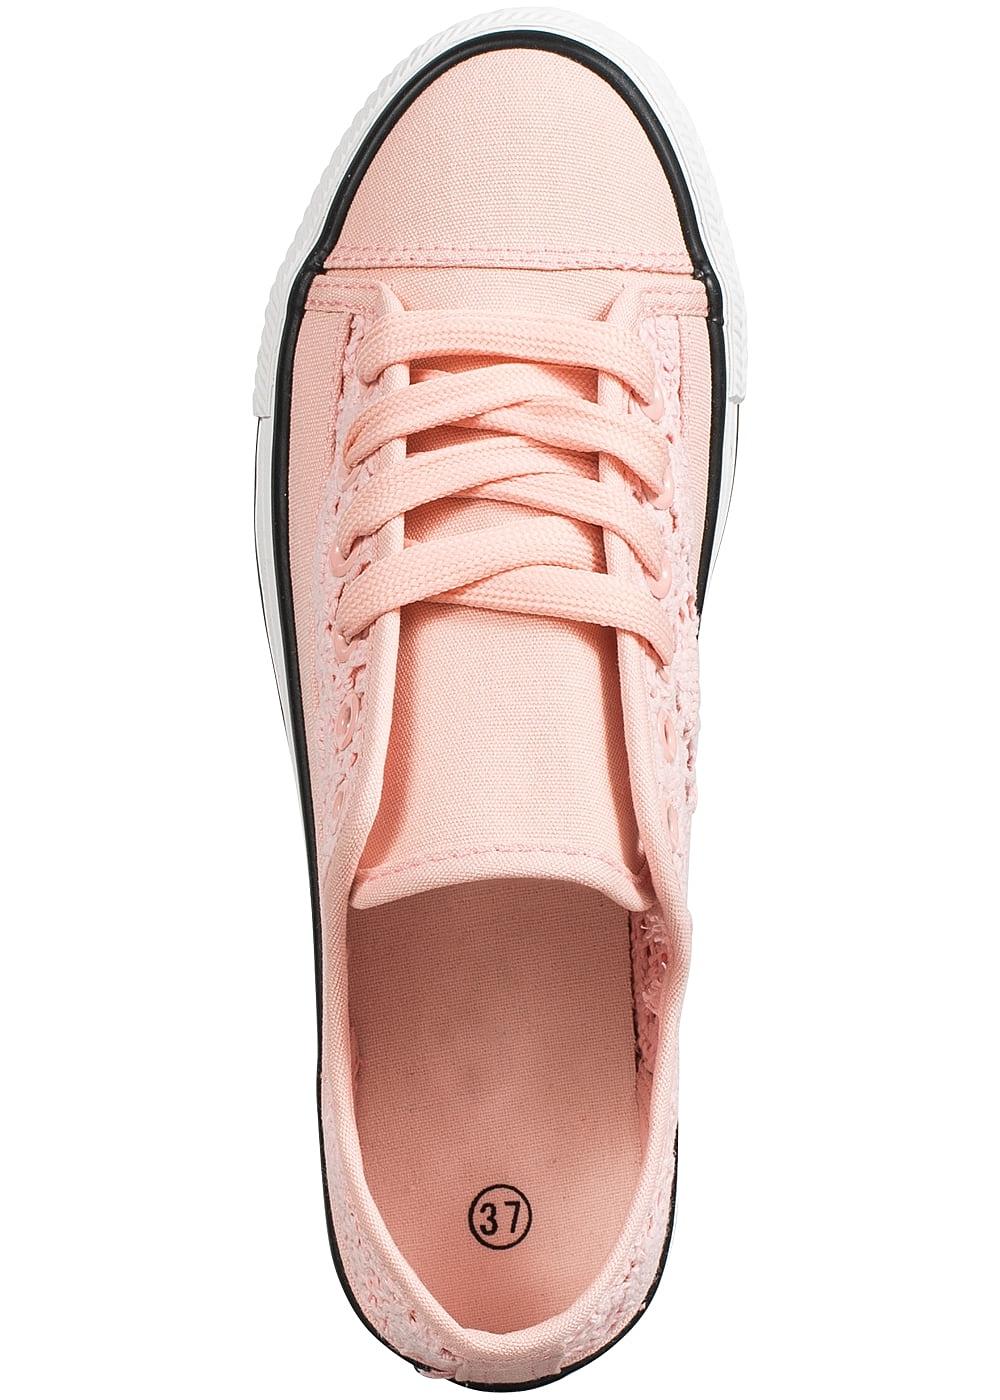 seventyseven lifestyle schuh damen sneaker zum binden h keleinsatz rosa 77onlineshop. Black Bedroom Furniture Sets. Home Design Ideas